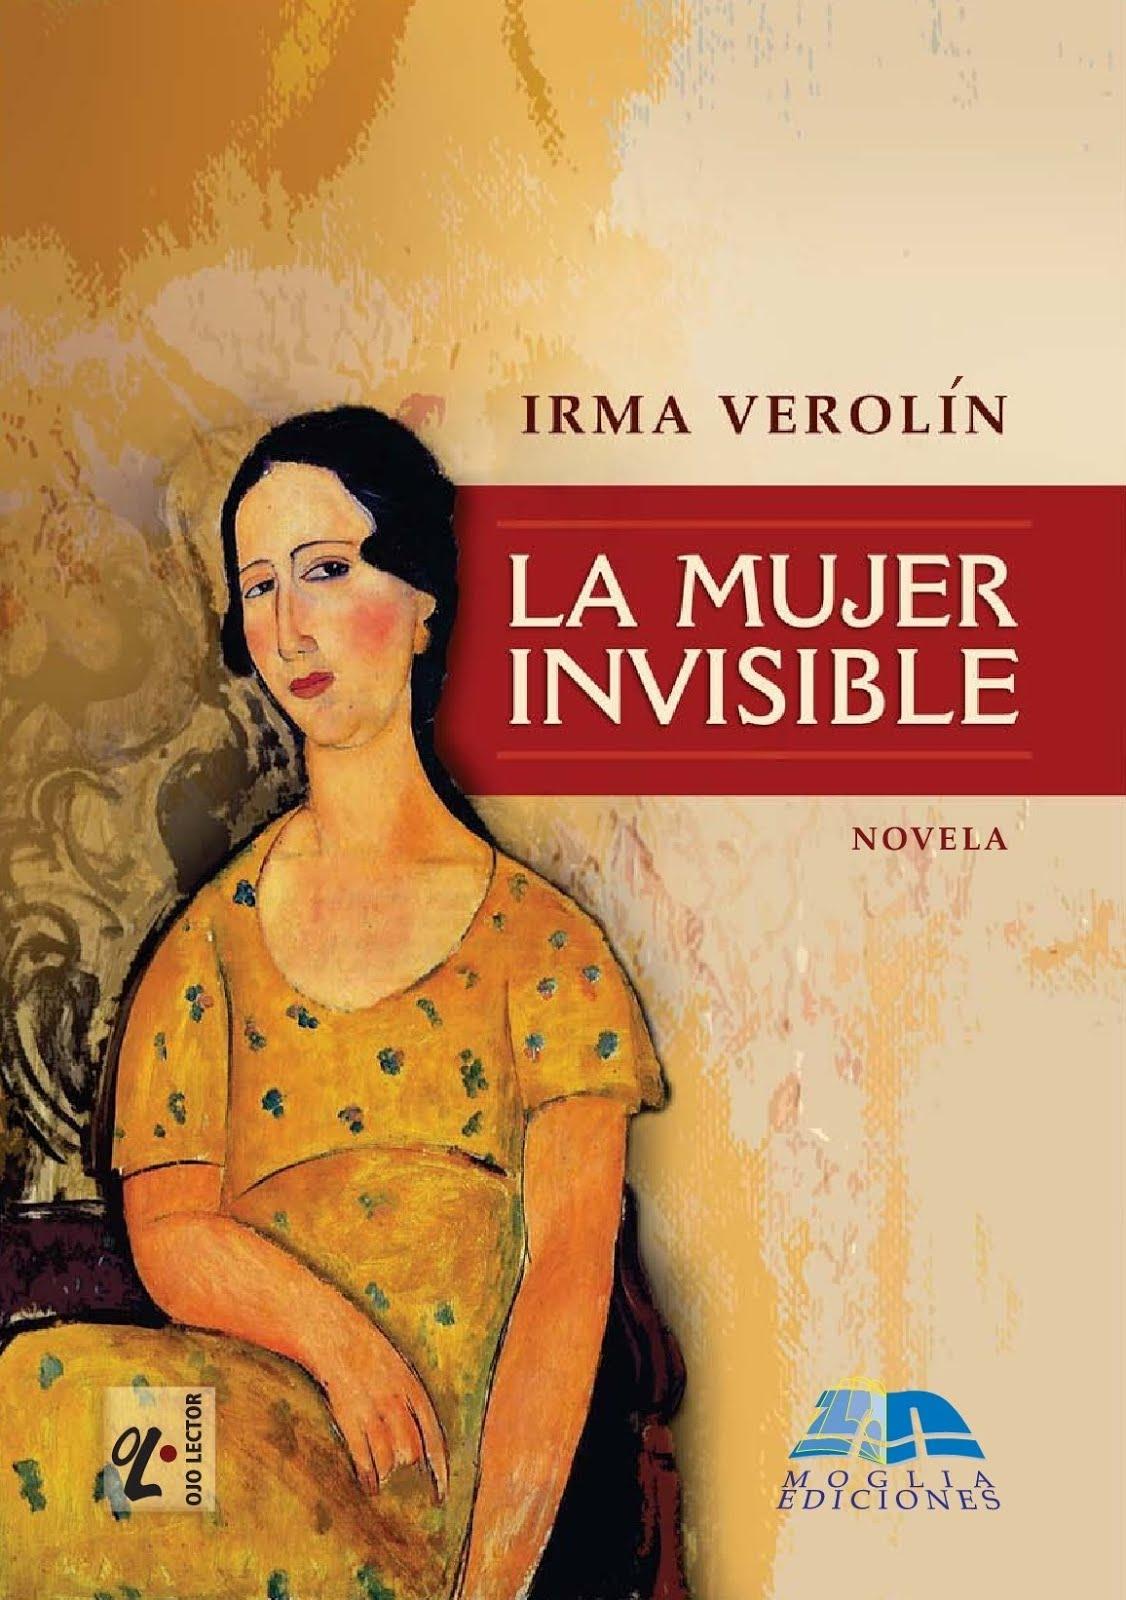 """La mujer invisible"". Moglia Ediciones, Corrientes 2018"